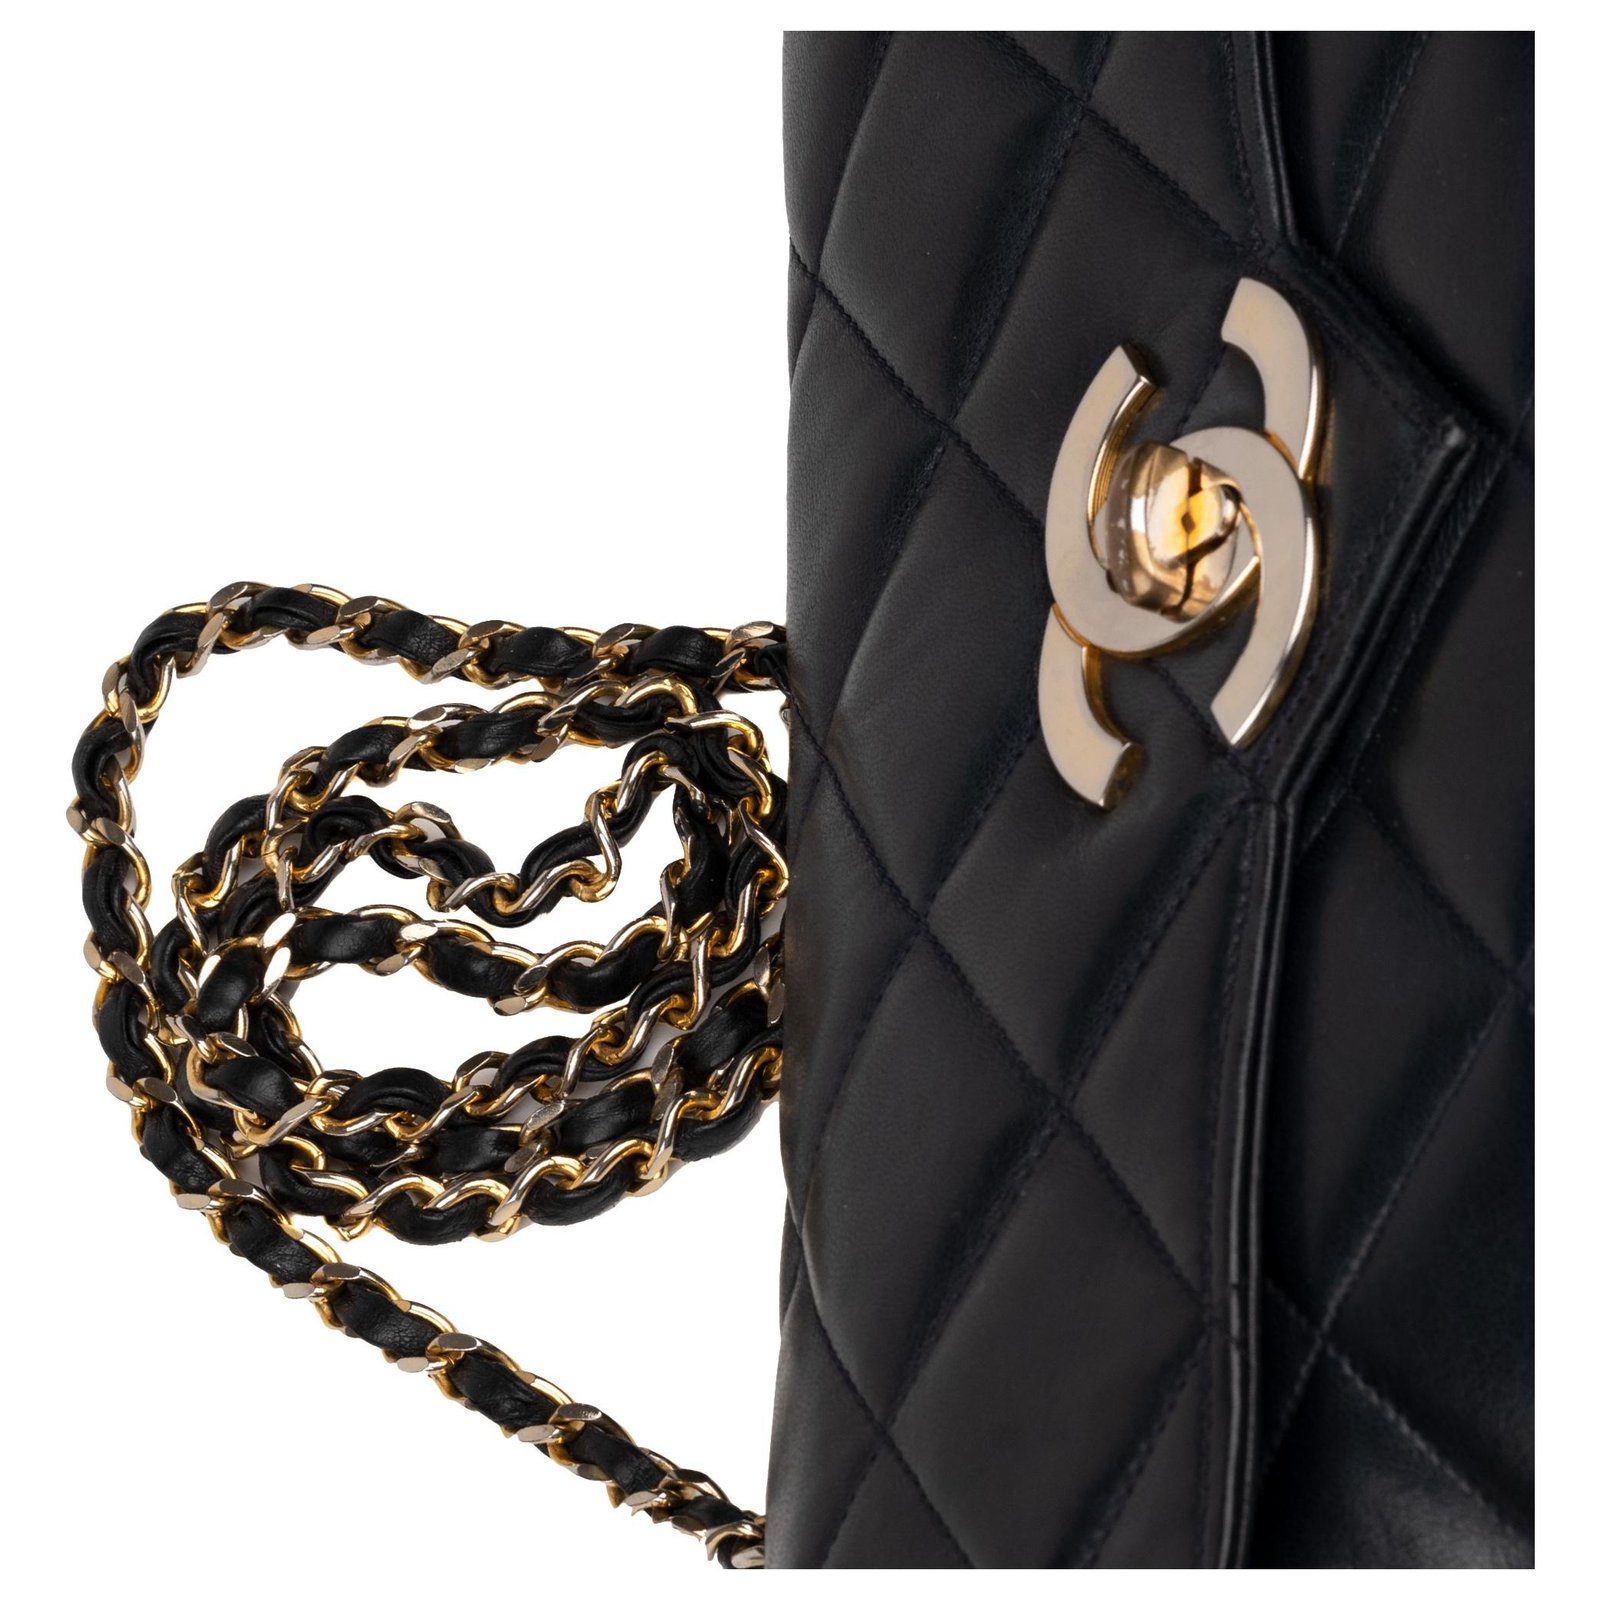 d132ad84e08d Chanel Classic vintage Chanel bag in navy quilted lambskin! Handbags  Lambskin Navy blue ref.124849 - Joli Closet